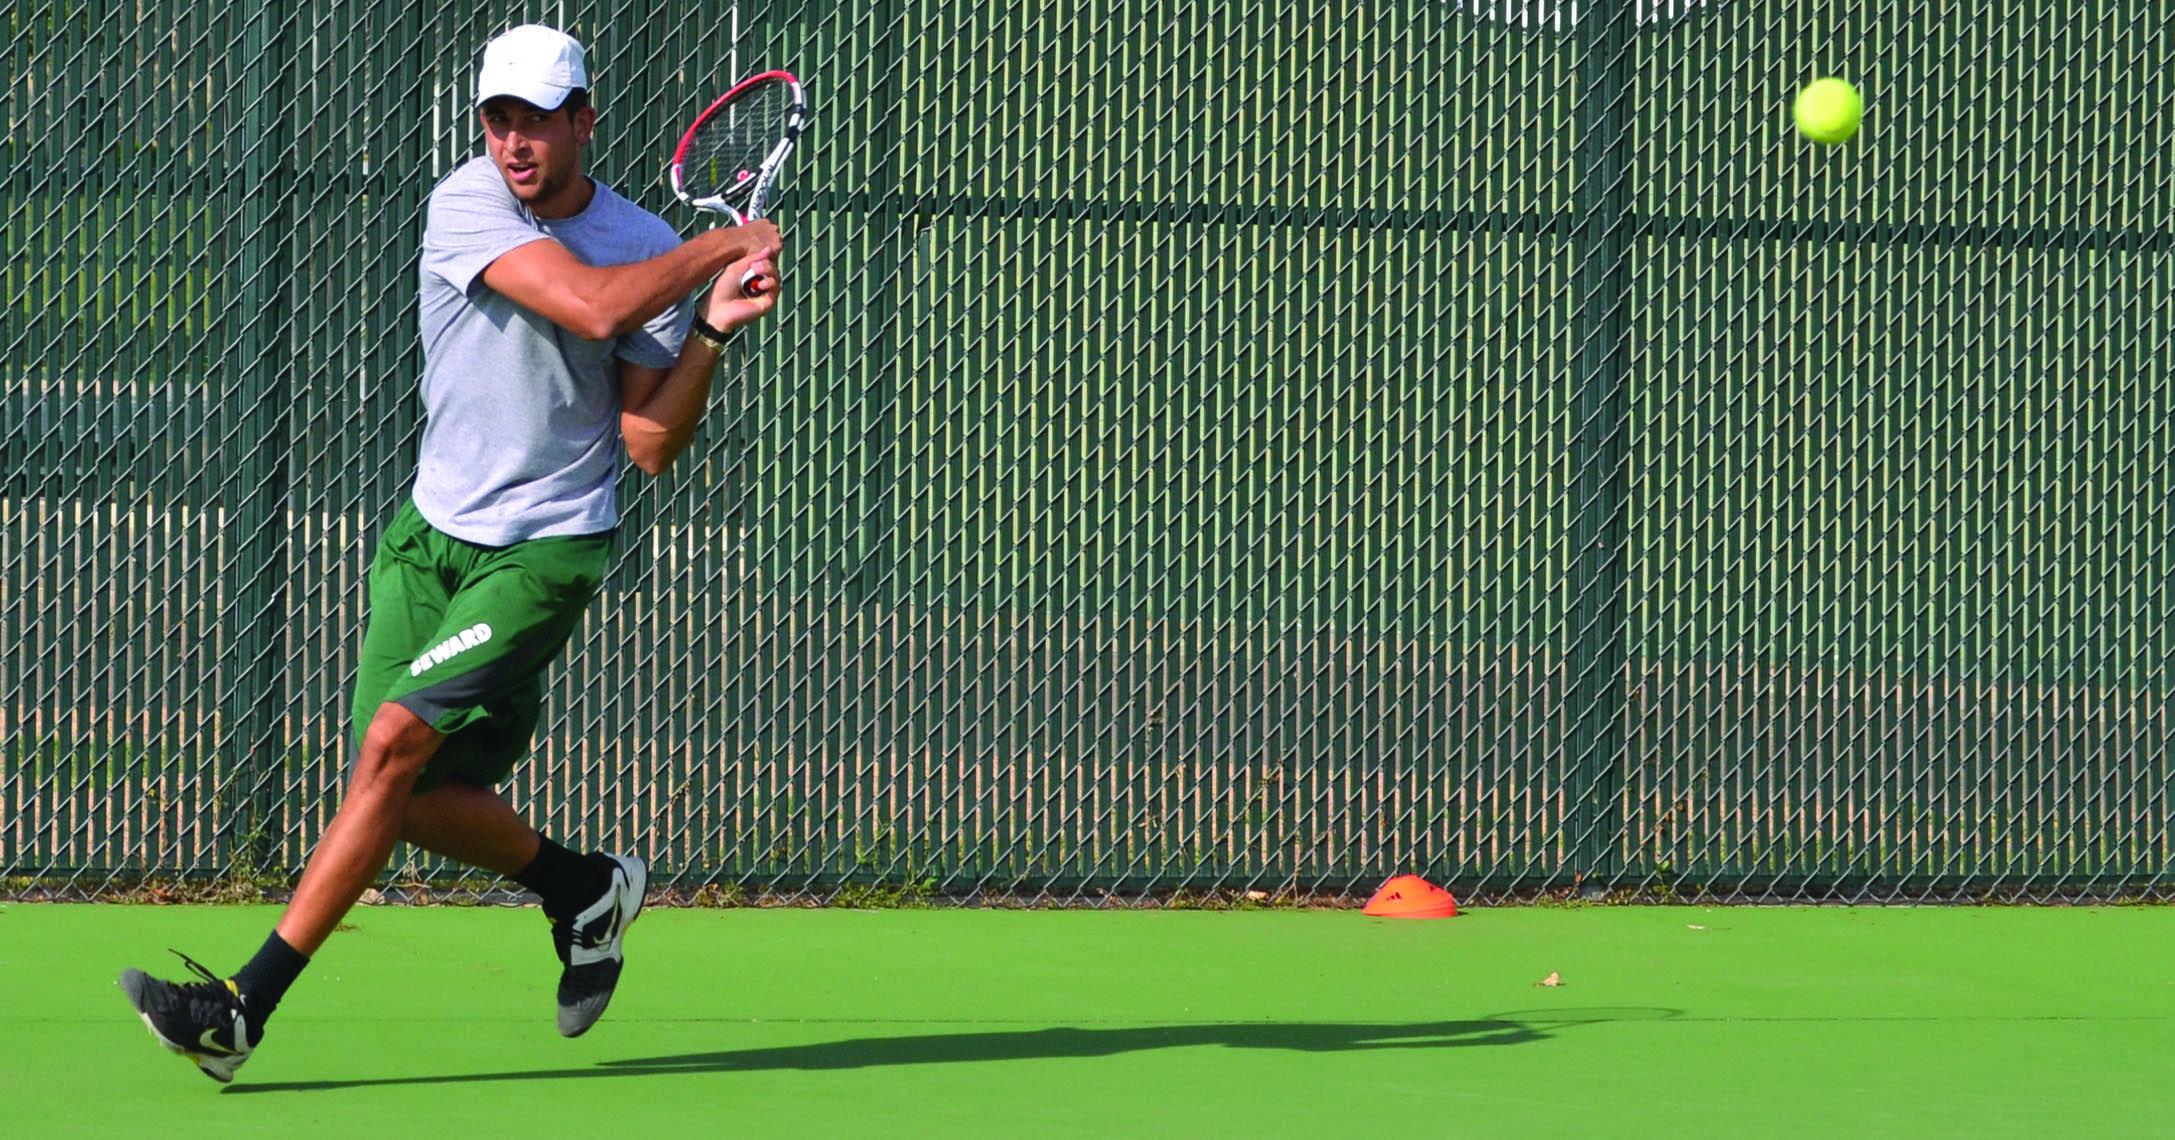 Saints and Lady Saints tennis teams face tough matches against four-year colleges